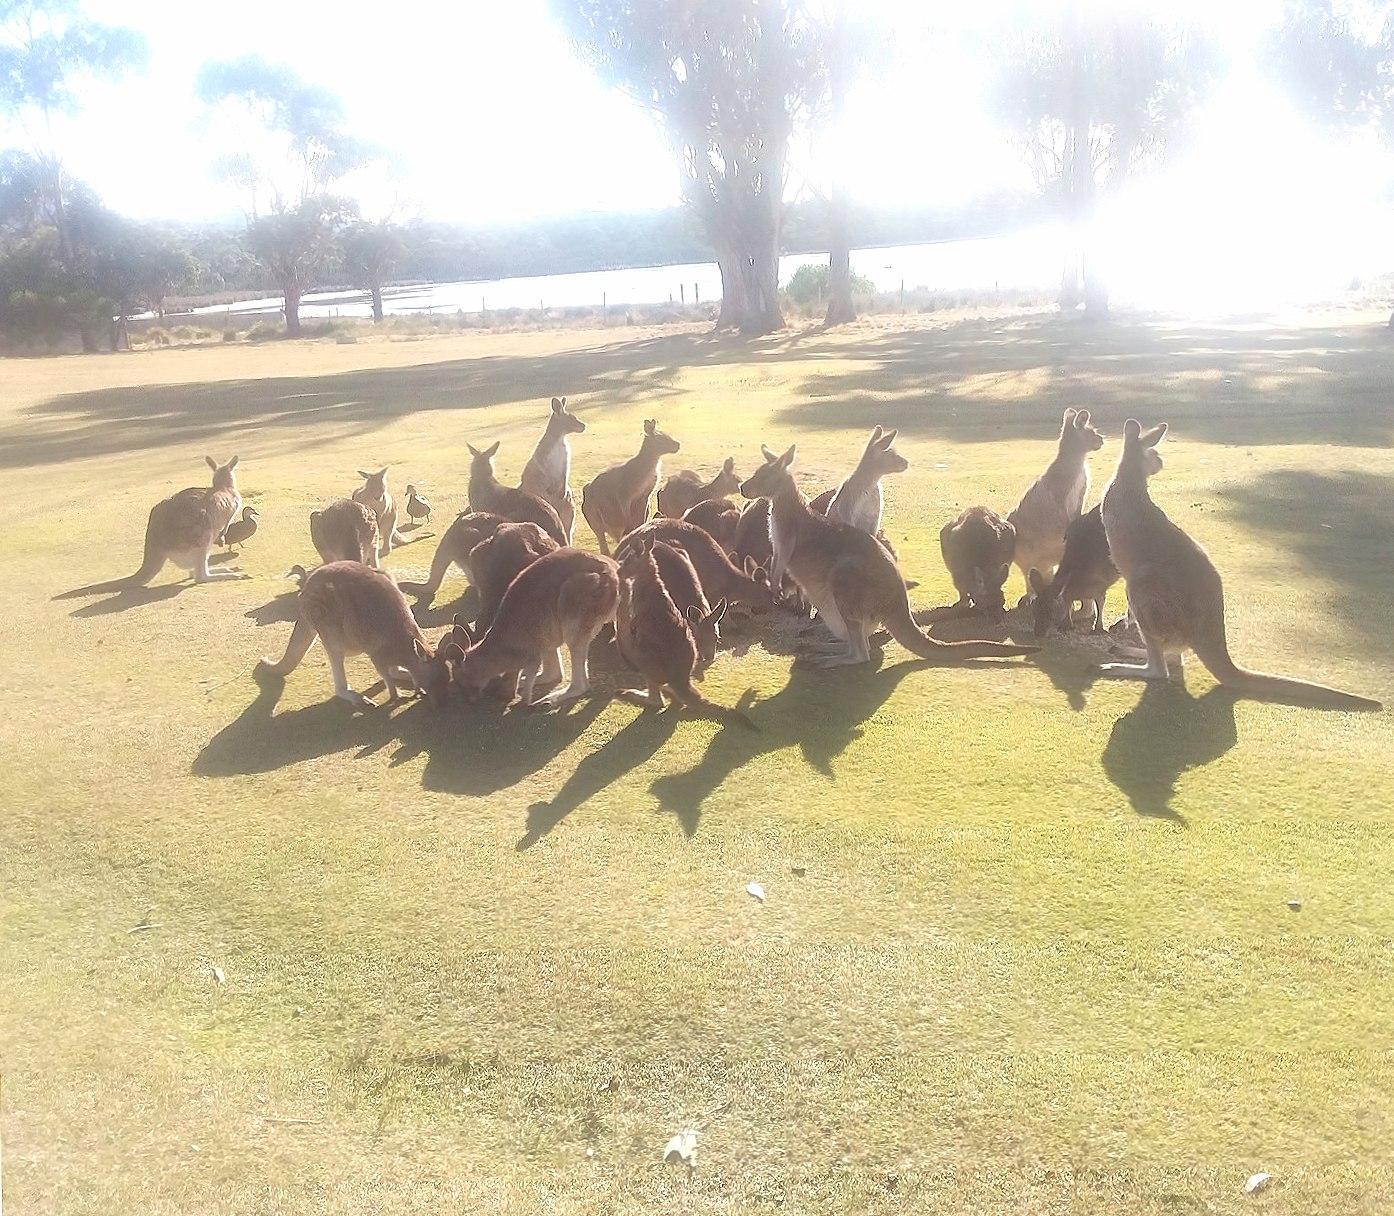 Kangaroos wallpapers HD quality